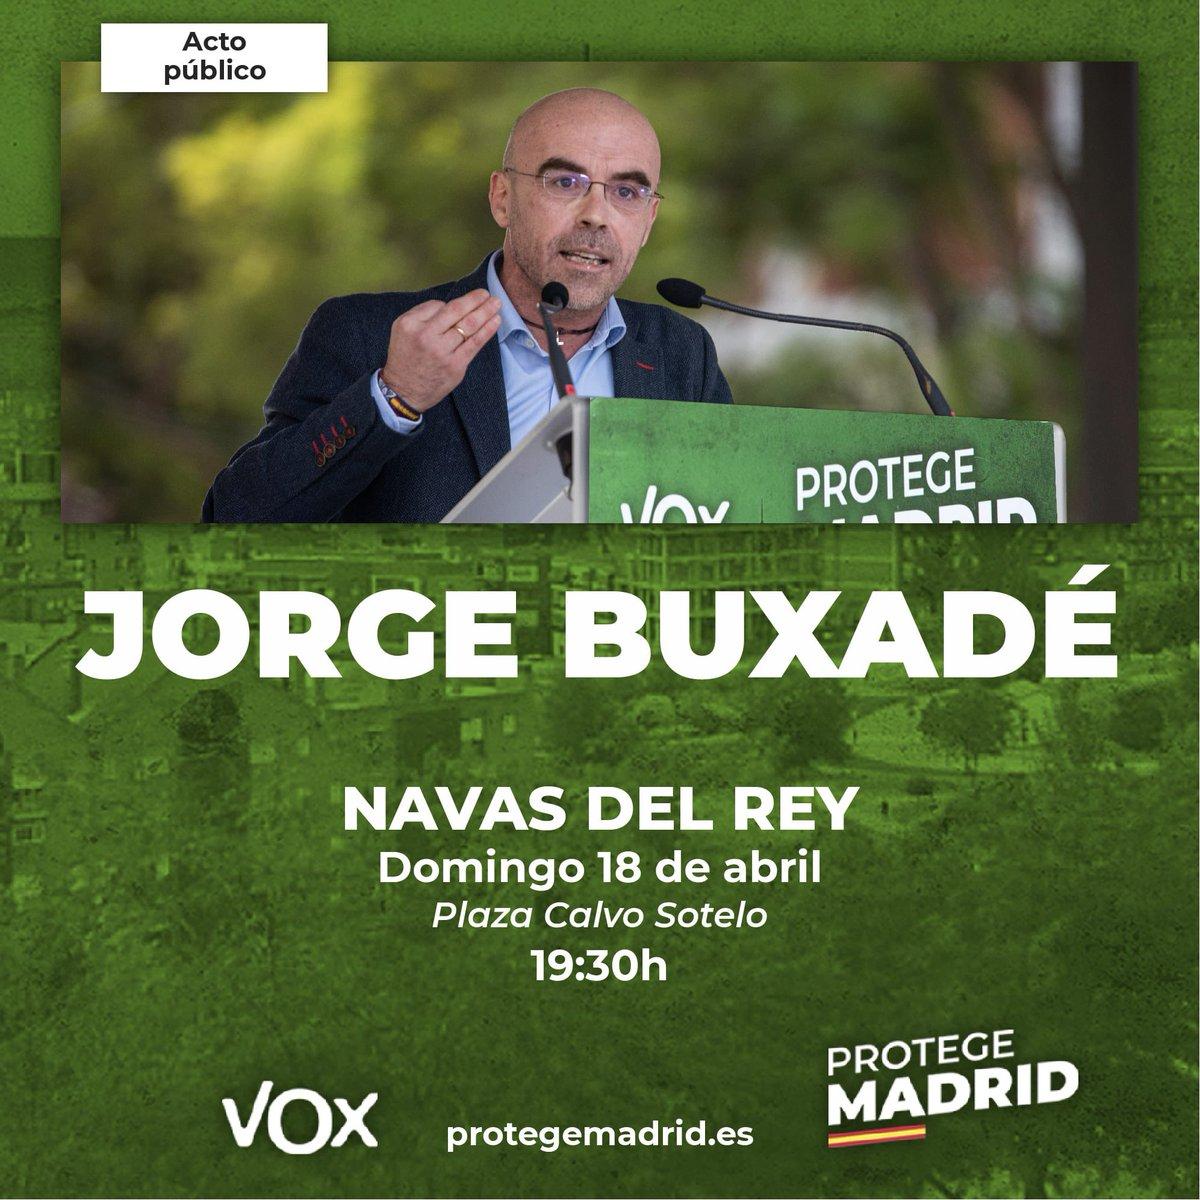 @Jorgebuxade's photo on Navas